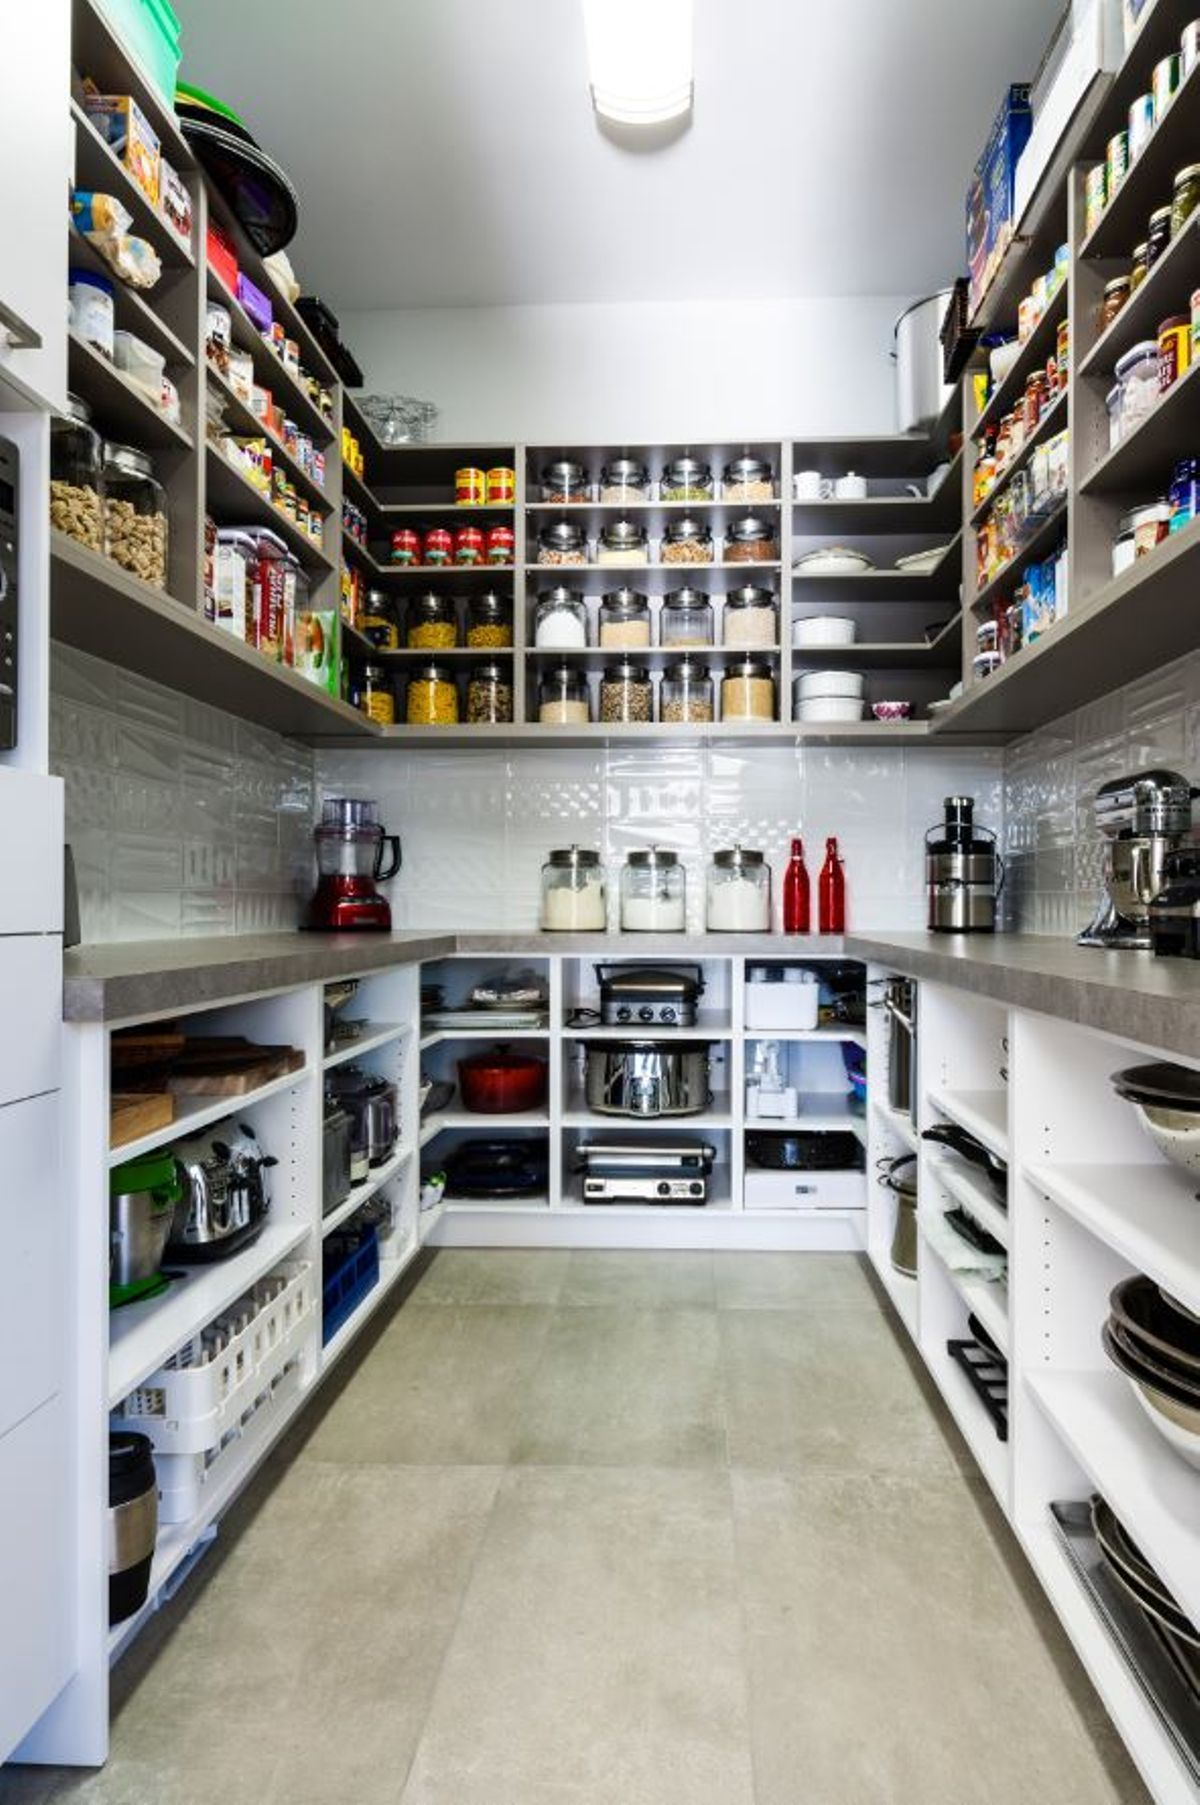 Que Mettre Dans Un Garde Manger influence design | inspirations | la pièce | rangement garde